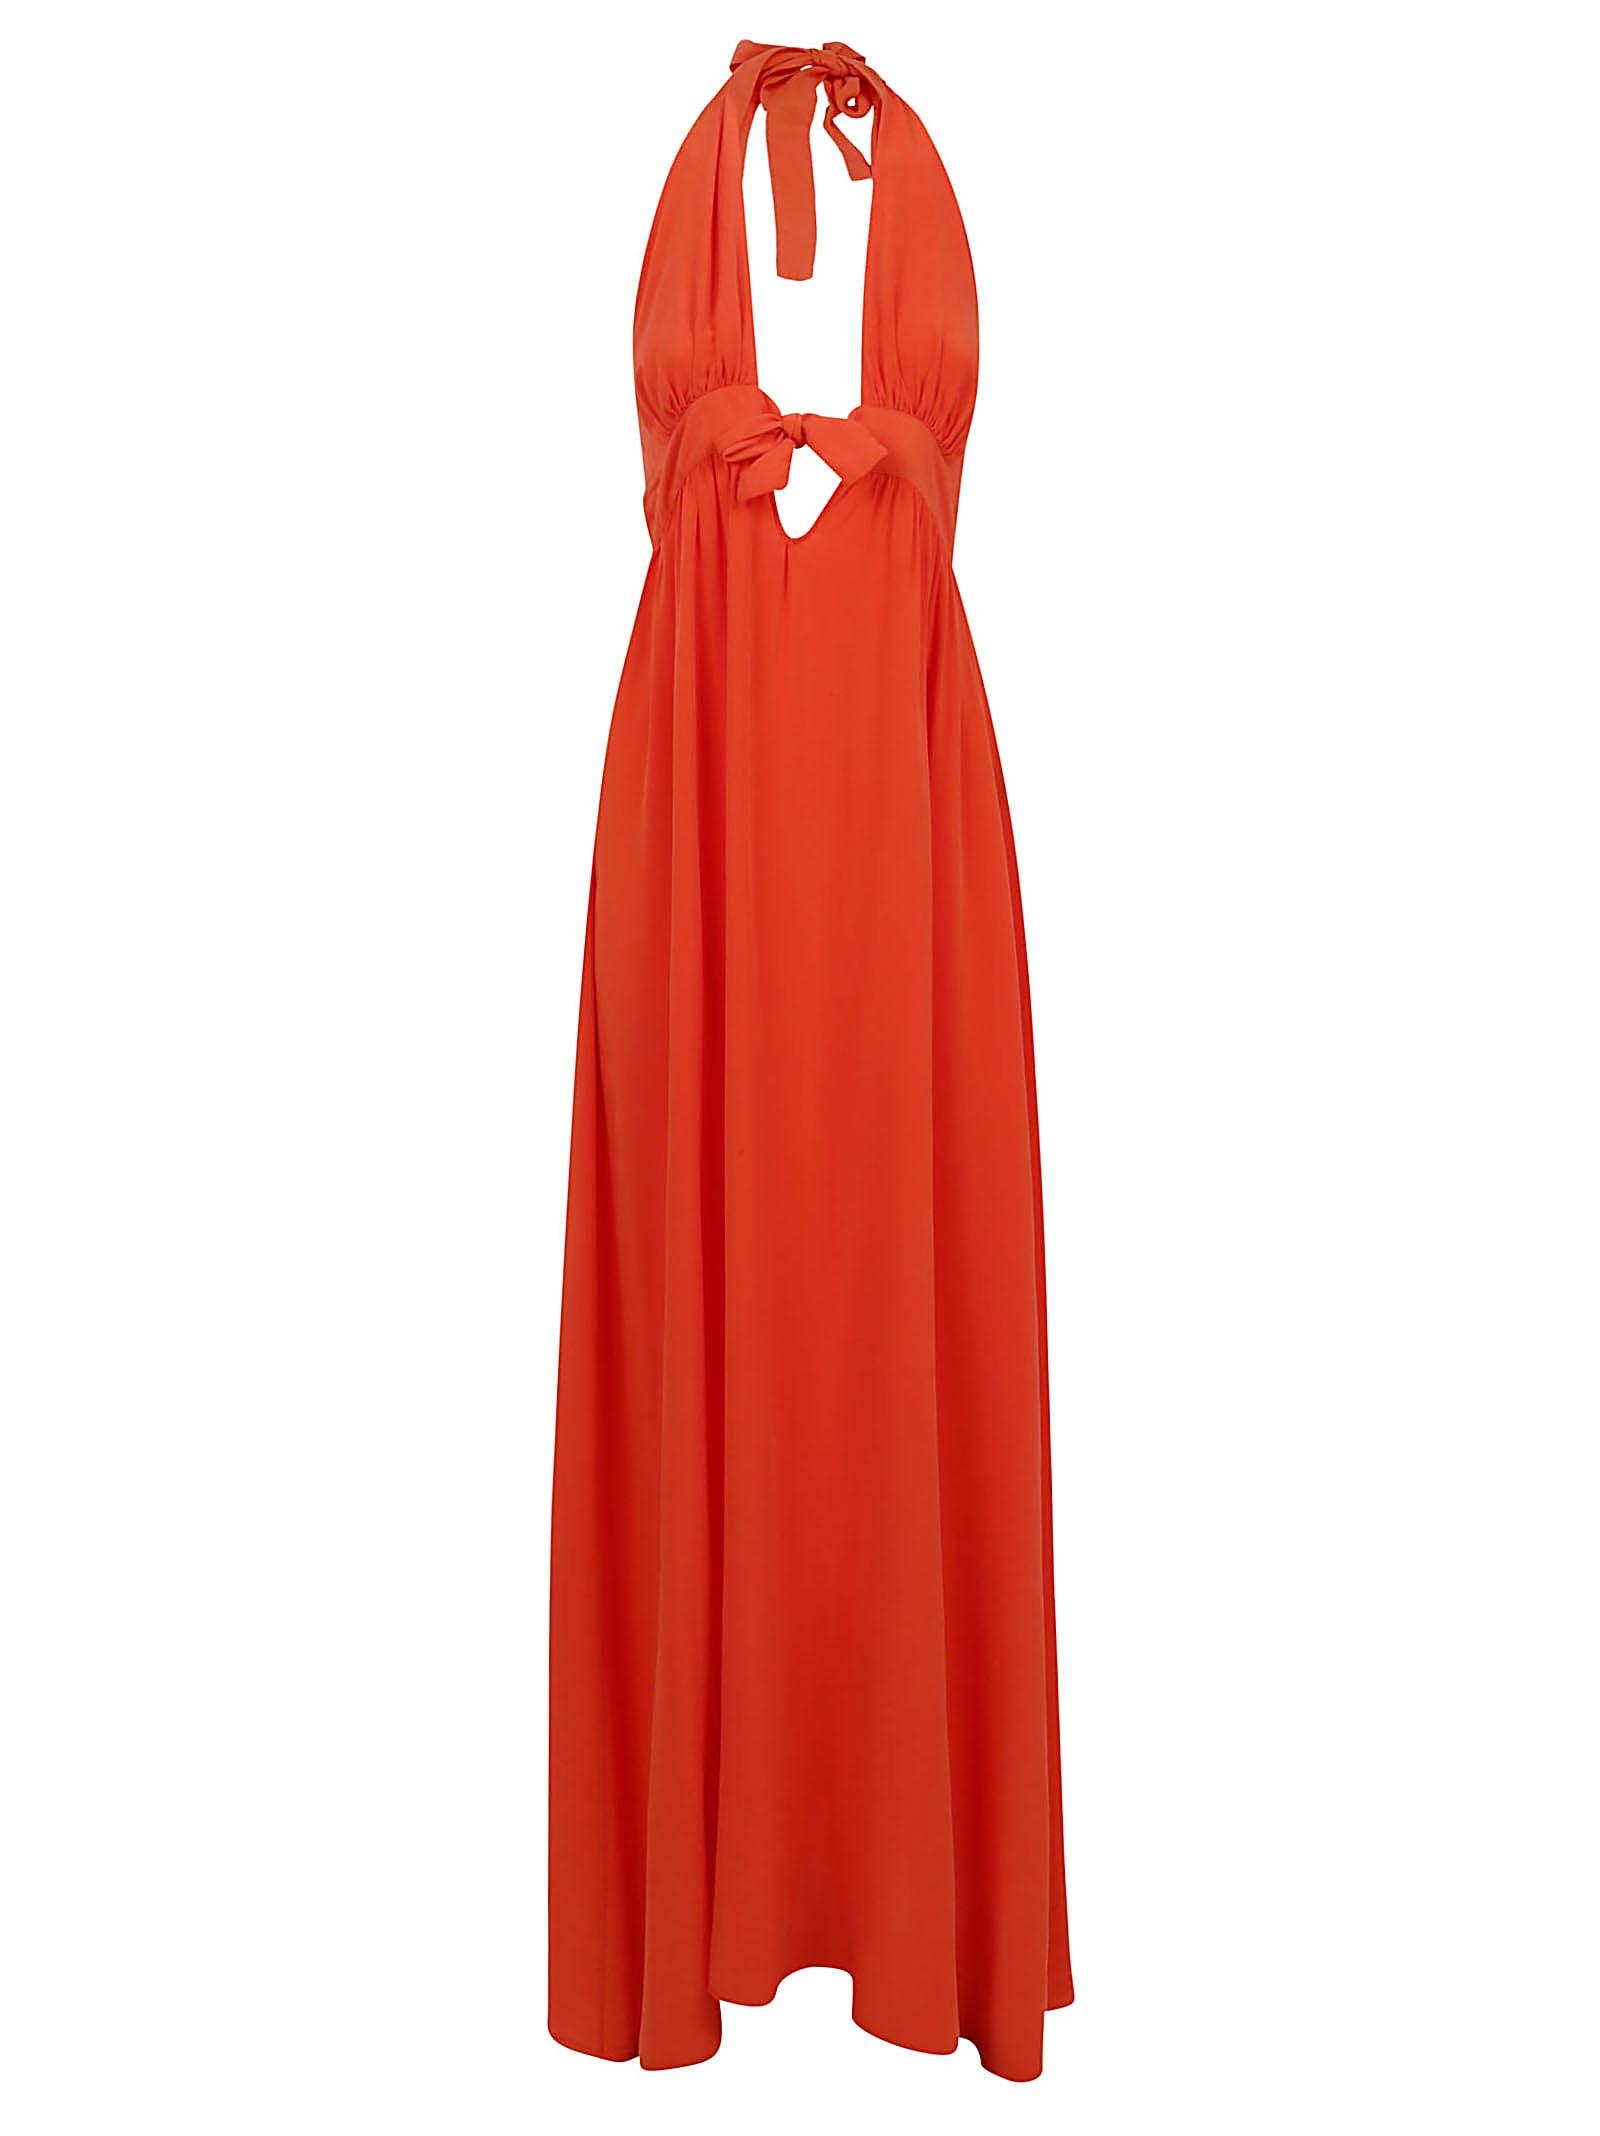 Buy Fisico - Cristina Ferrari Long Sleeveless Dress online, shop Fisico - Cristina Ferrari with free shipping